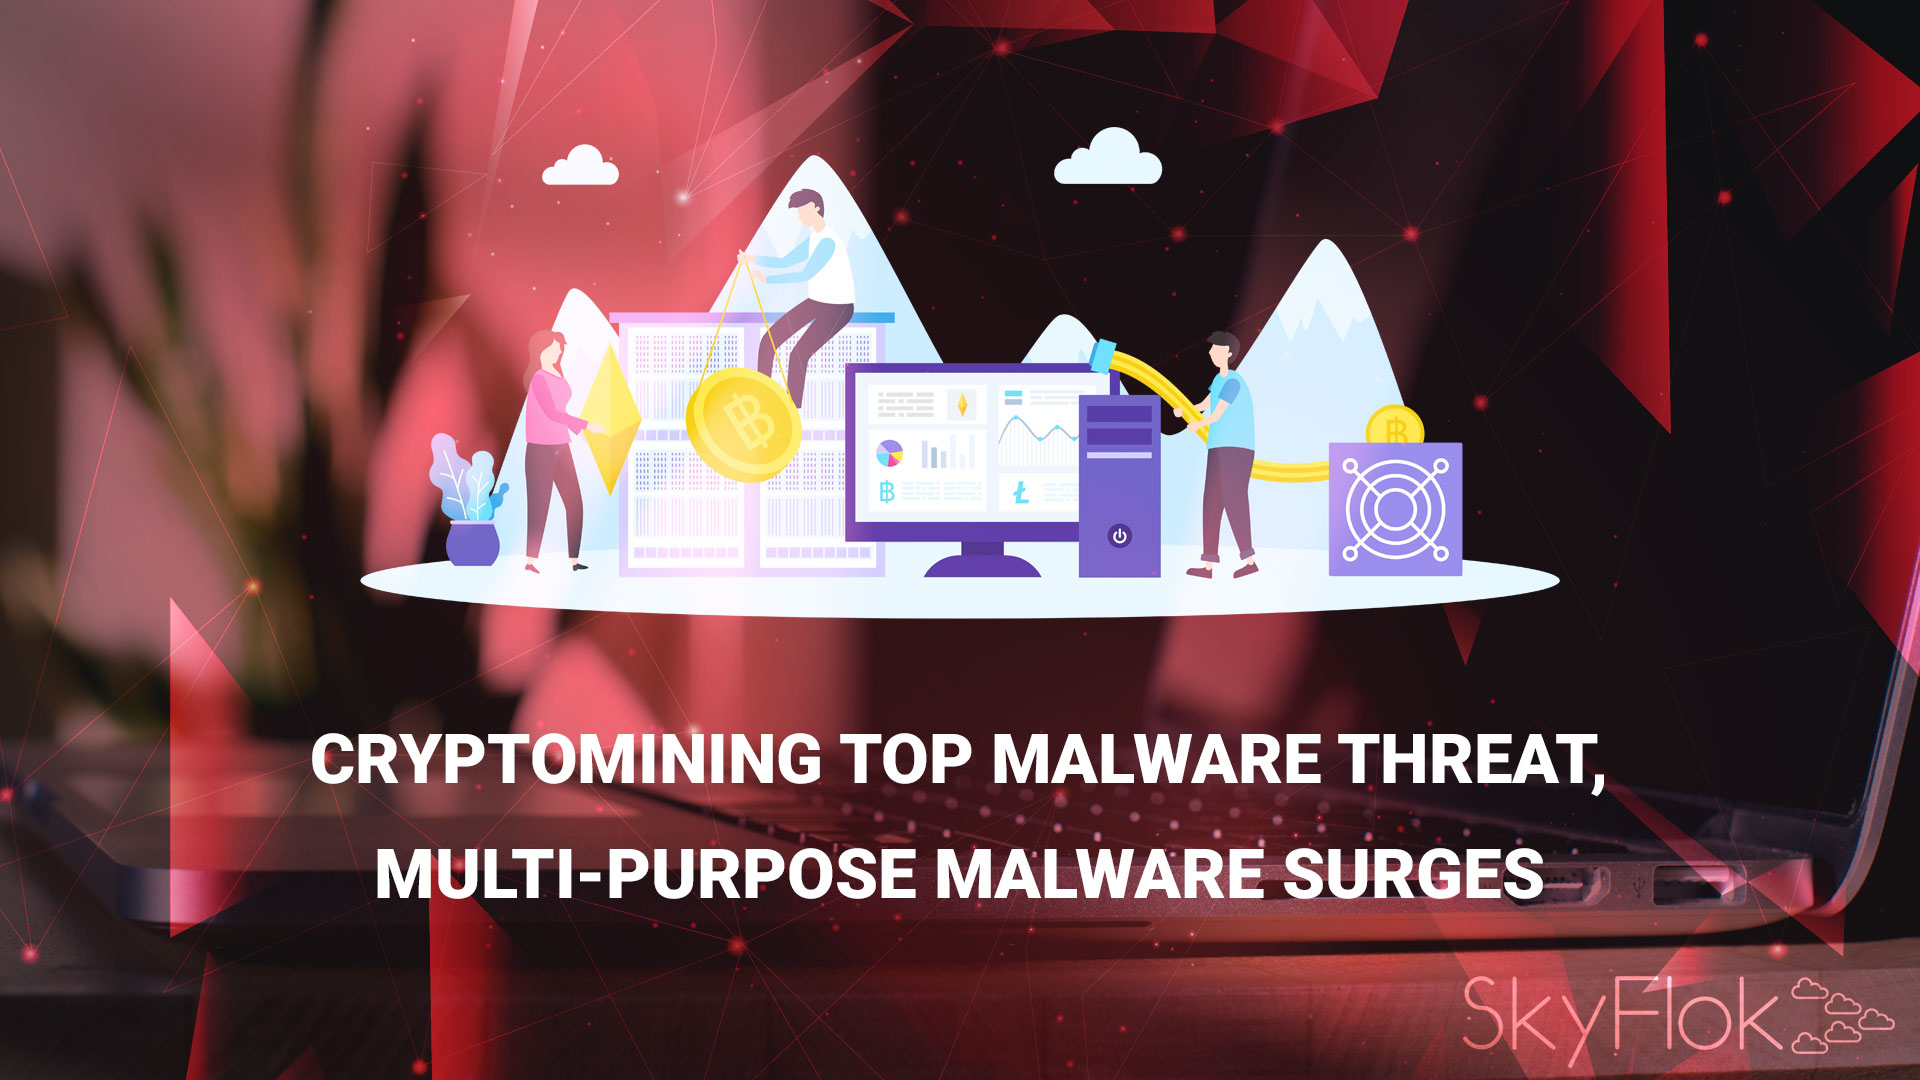 Cryptomining Top Malware Threat, Multi-Purpose Malware Surges